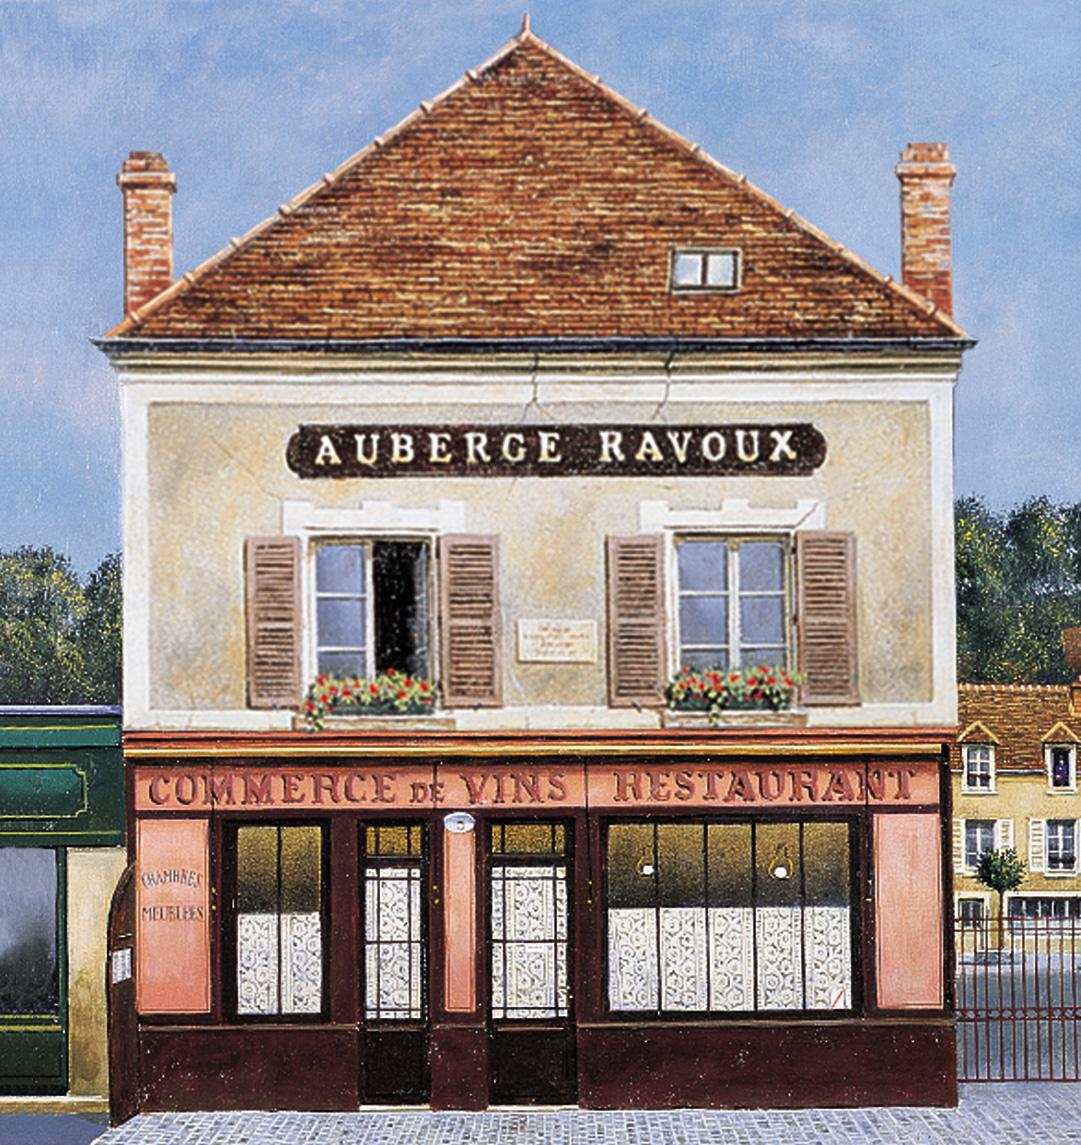 AubergeRavoux-100-Façade-Ravoux-dessin-ht-def@InstitutVanGogh